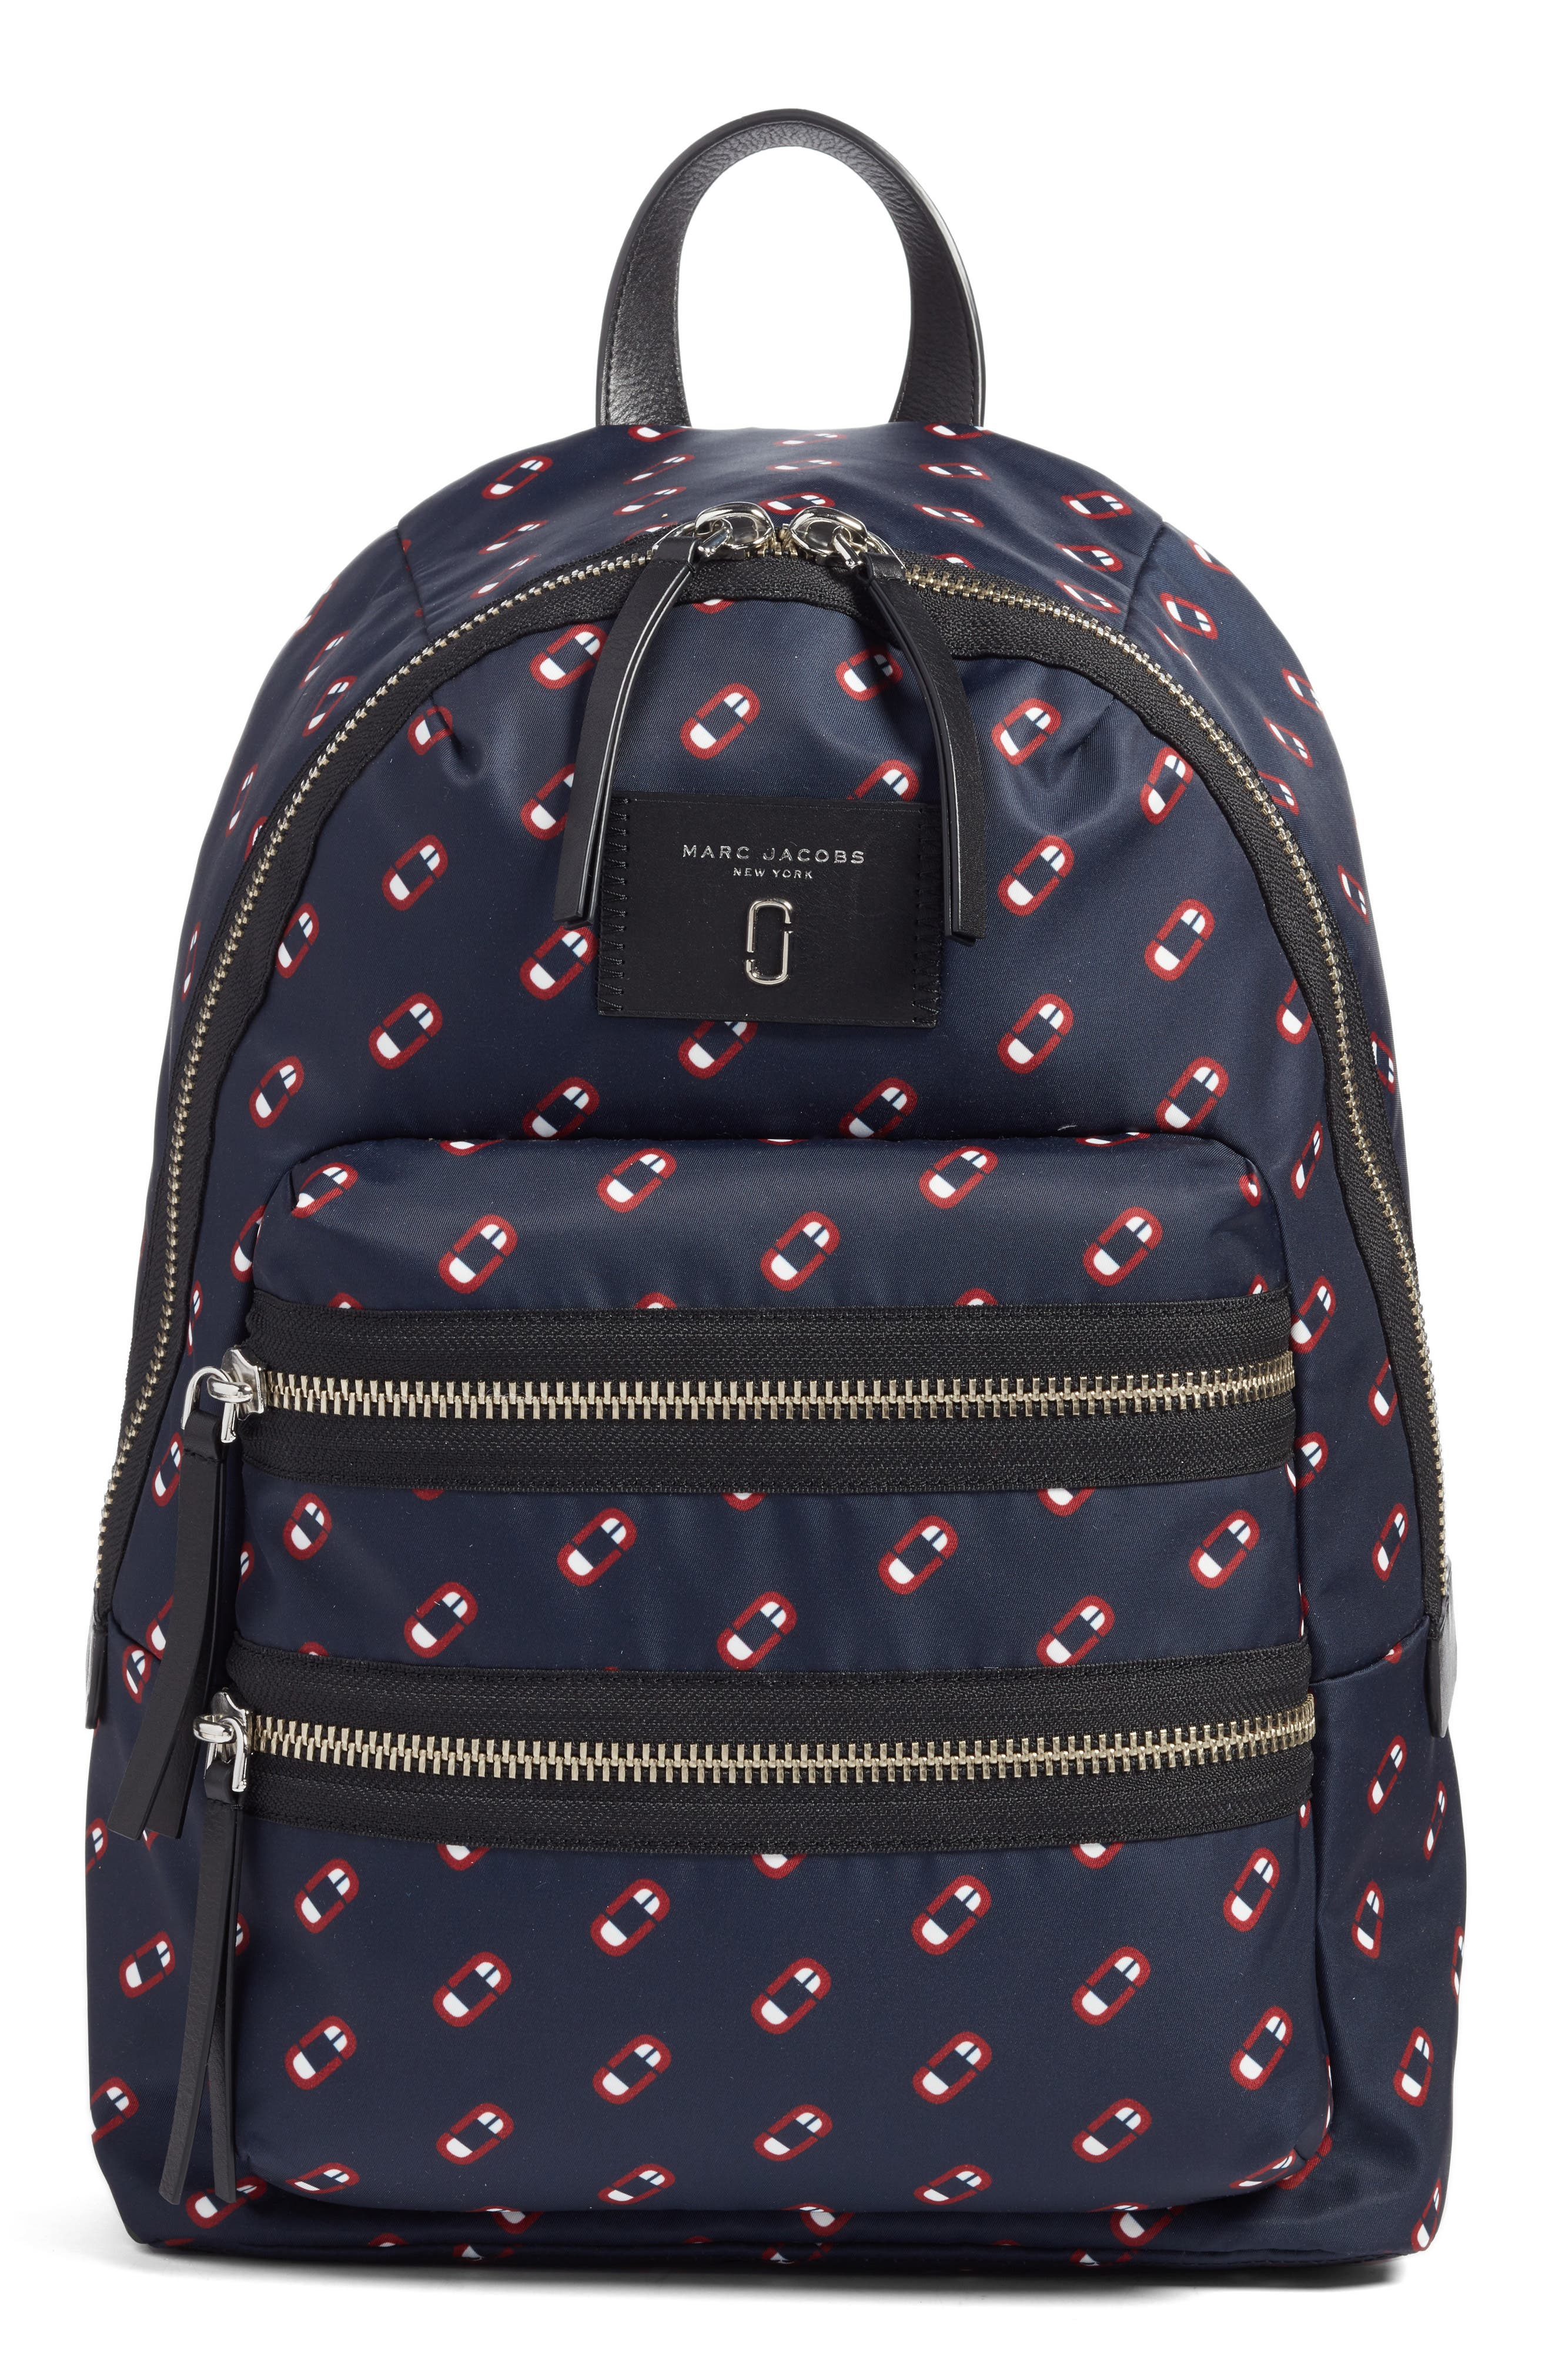 MARC JACOBS Logo Scream Biker Backpack